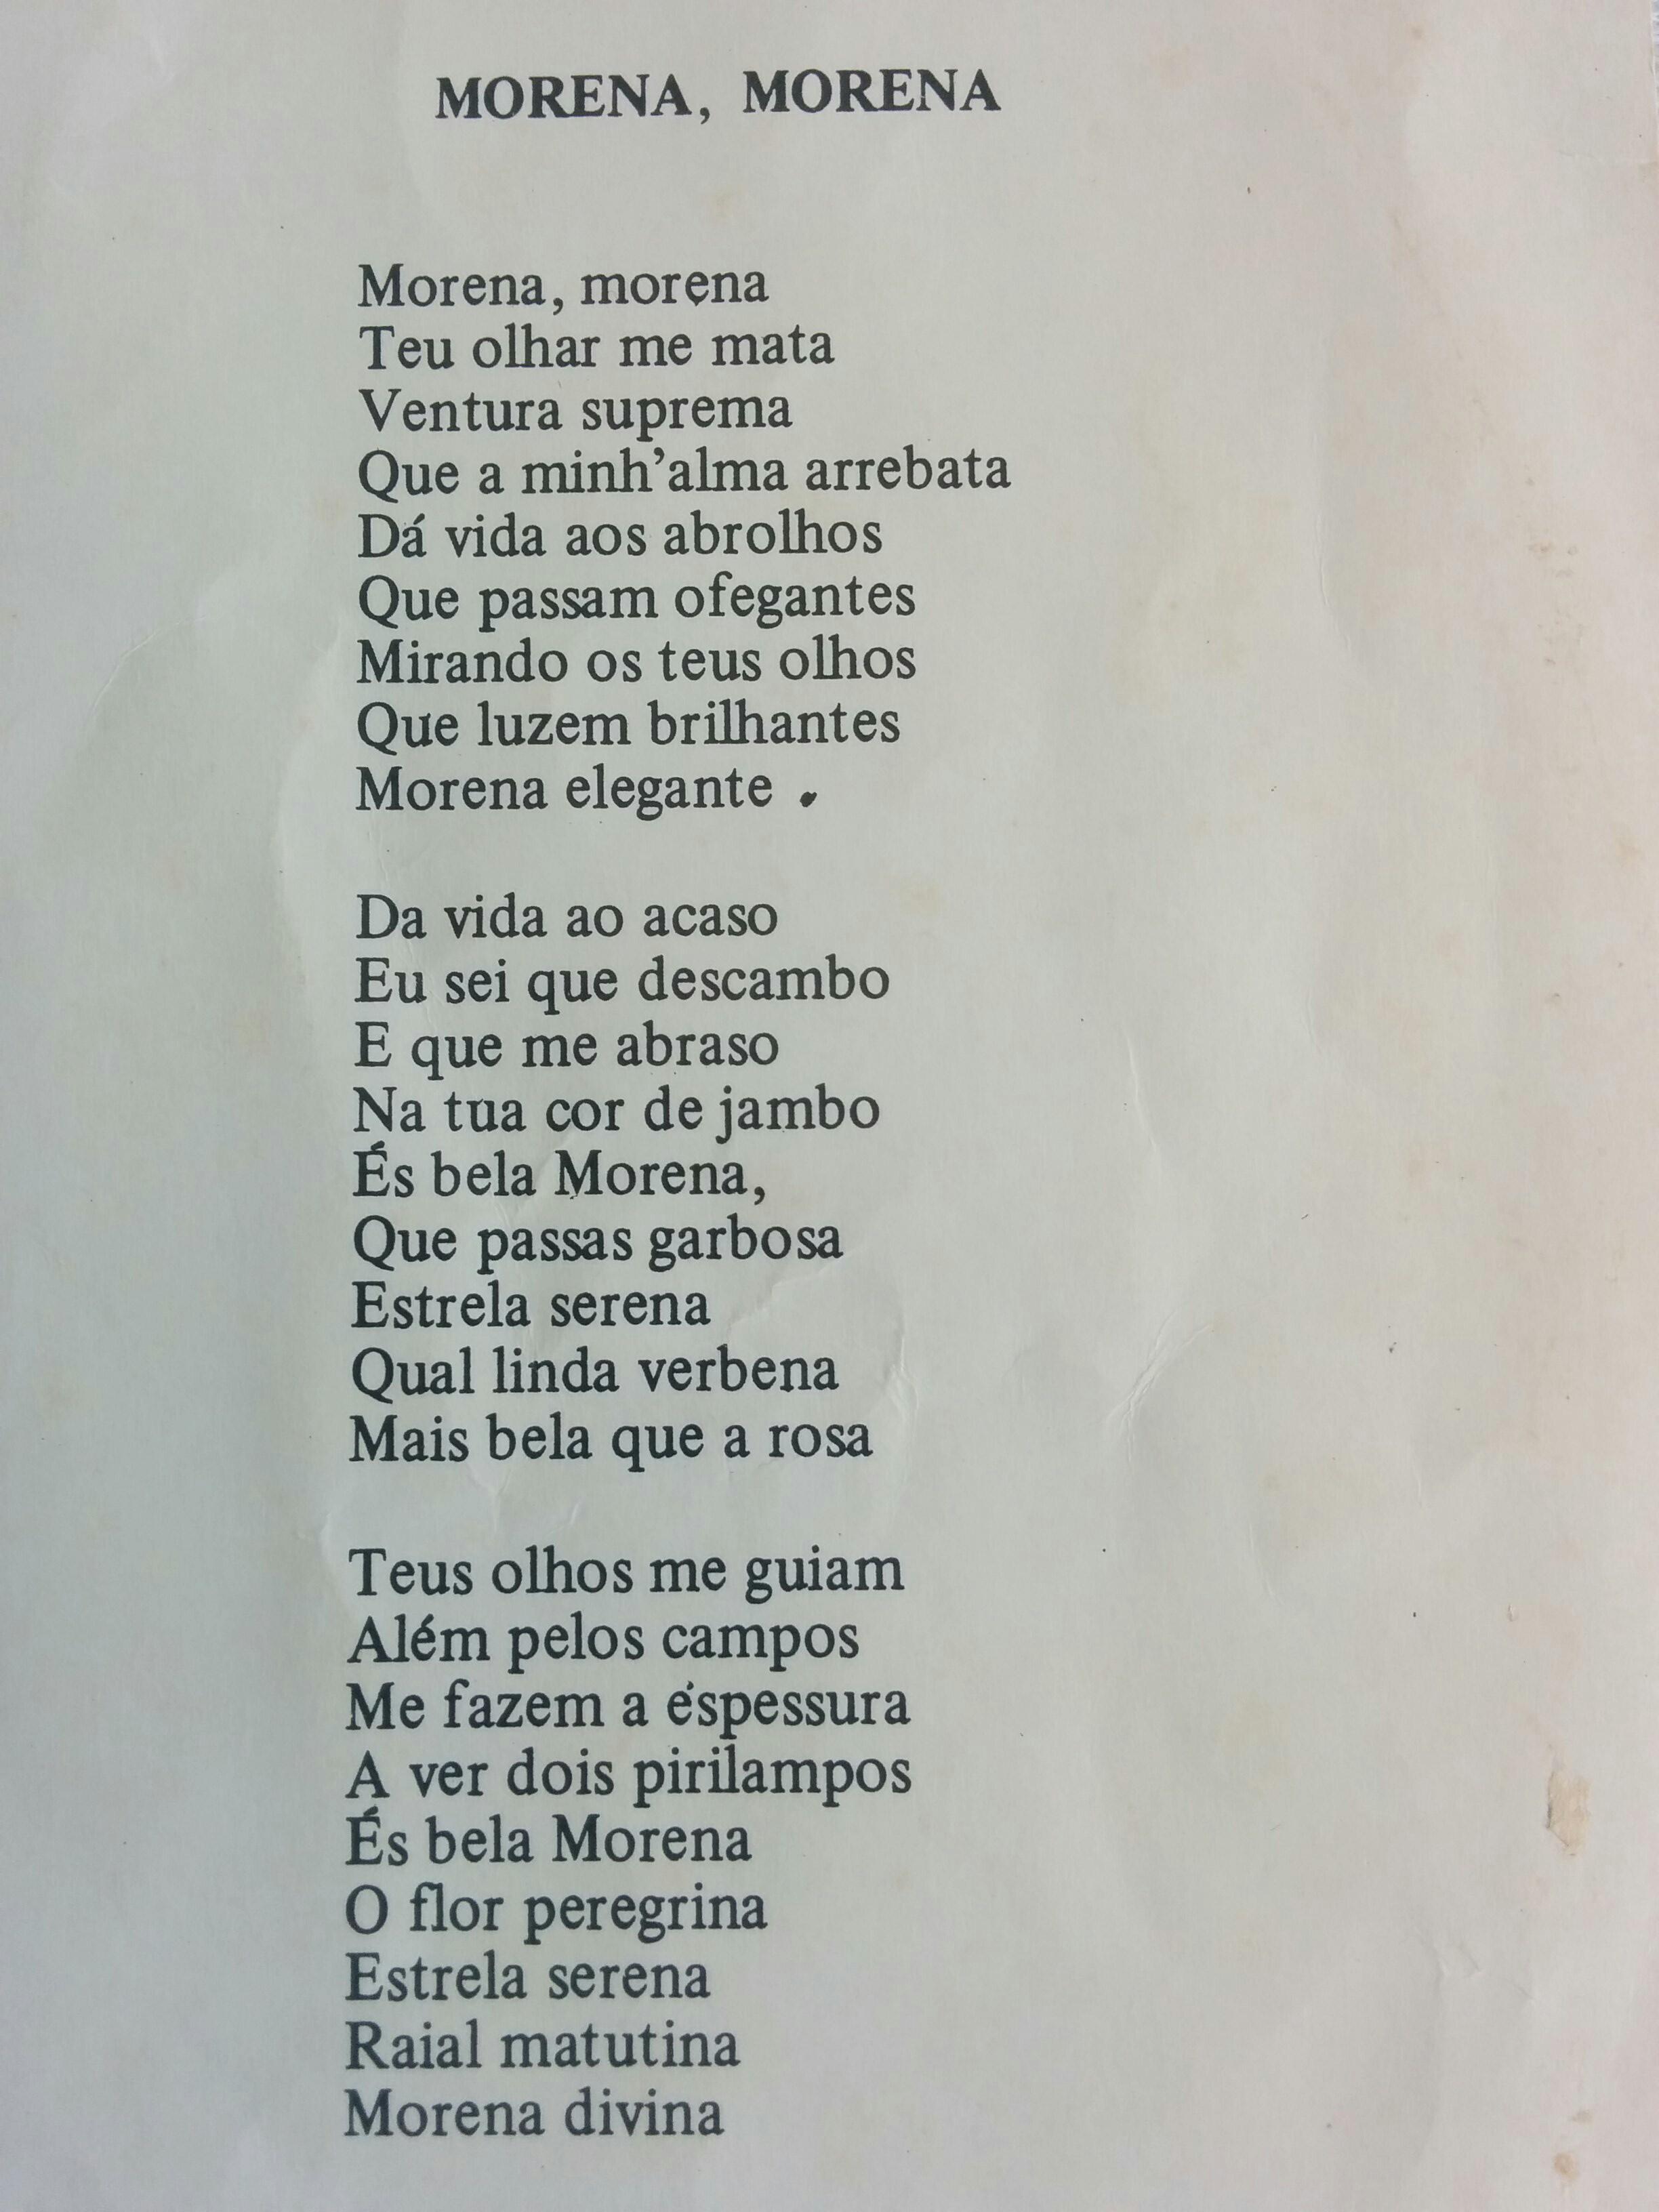 Morena,